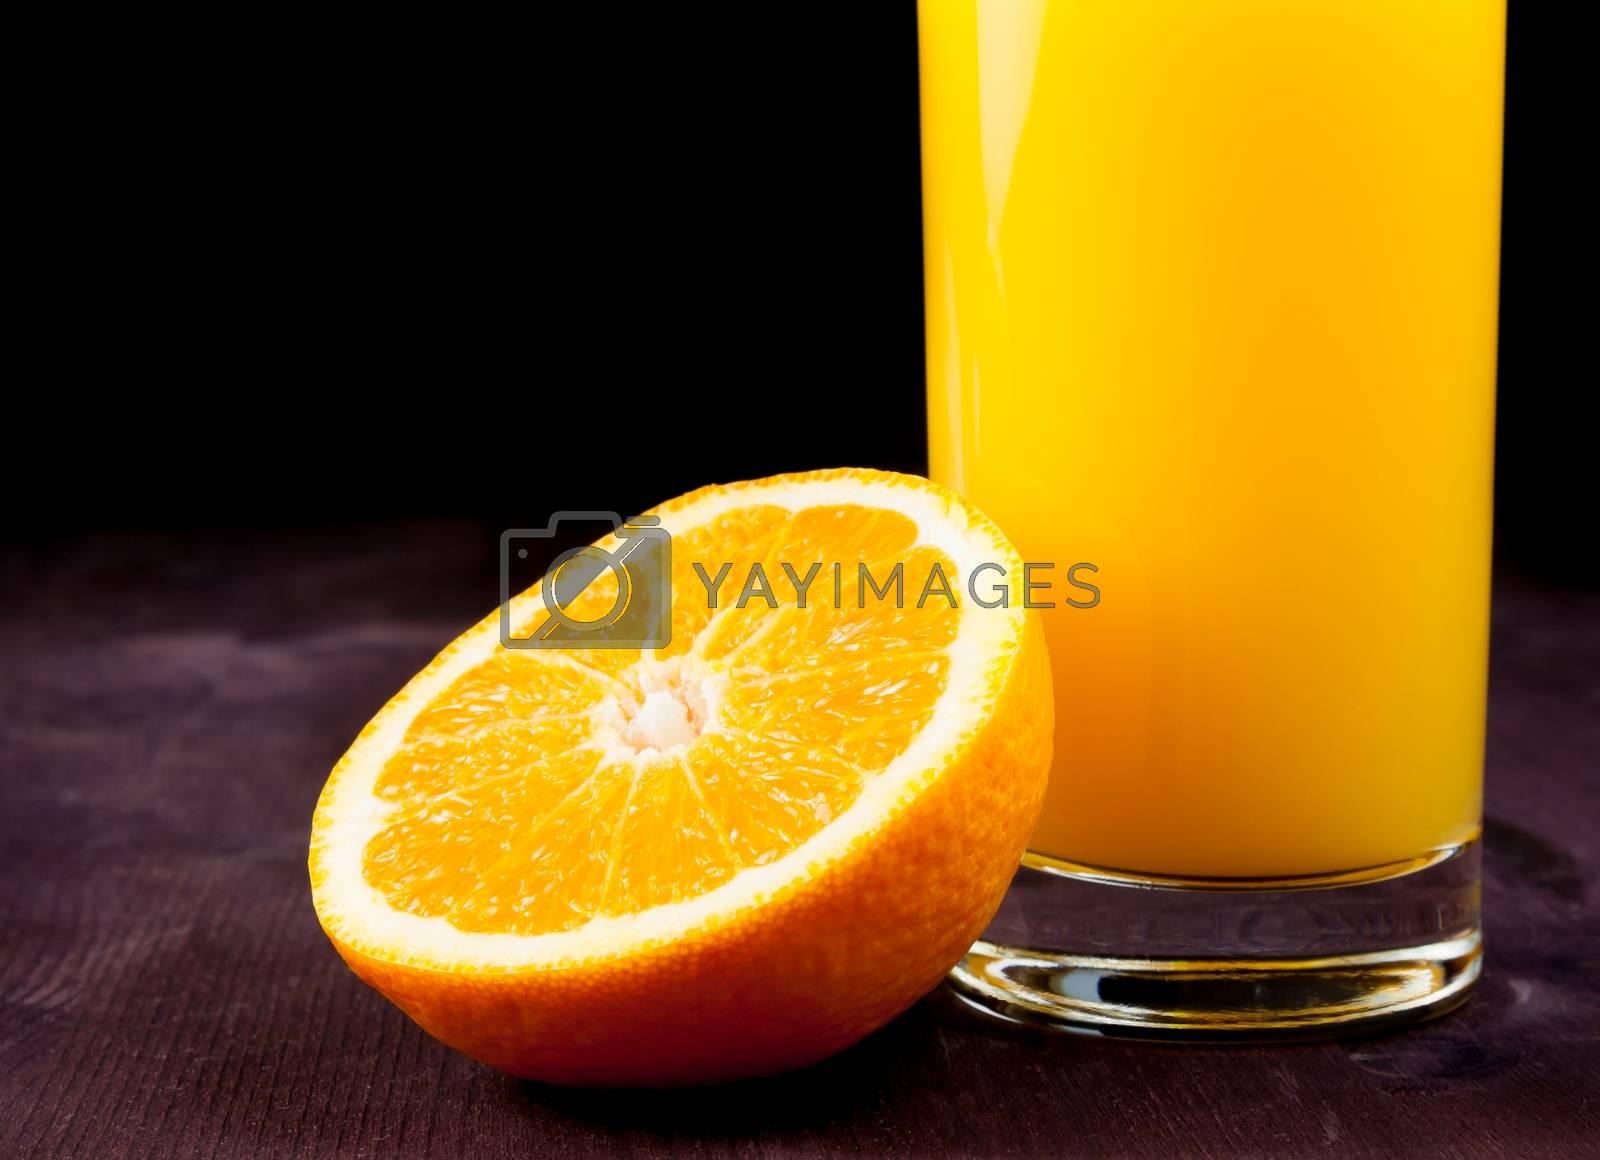 detail of full glass of orange juice near half orange by donfiore